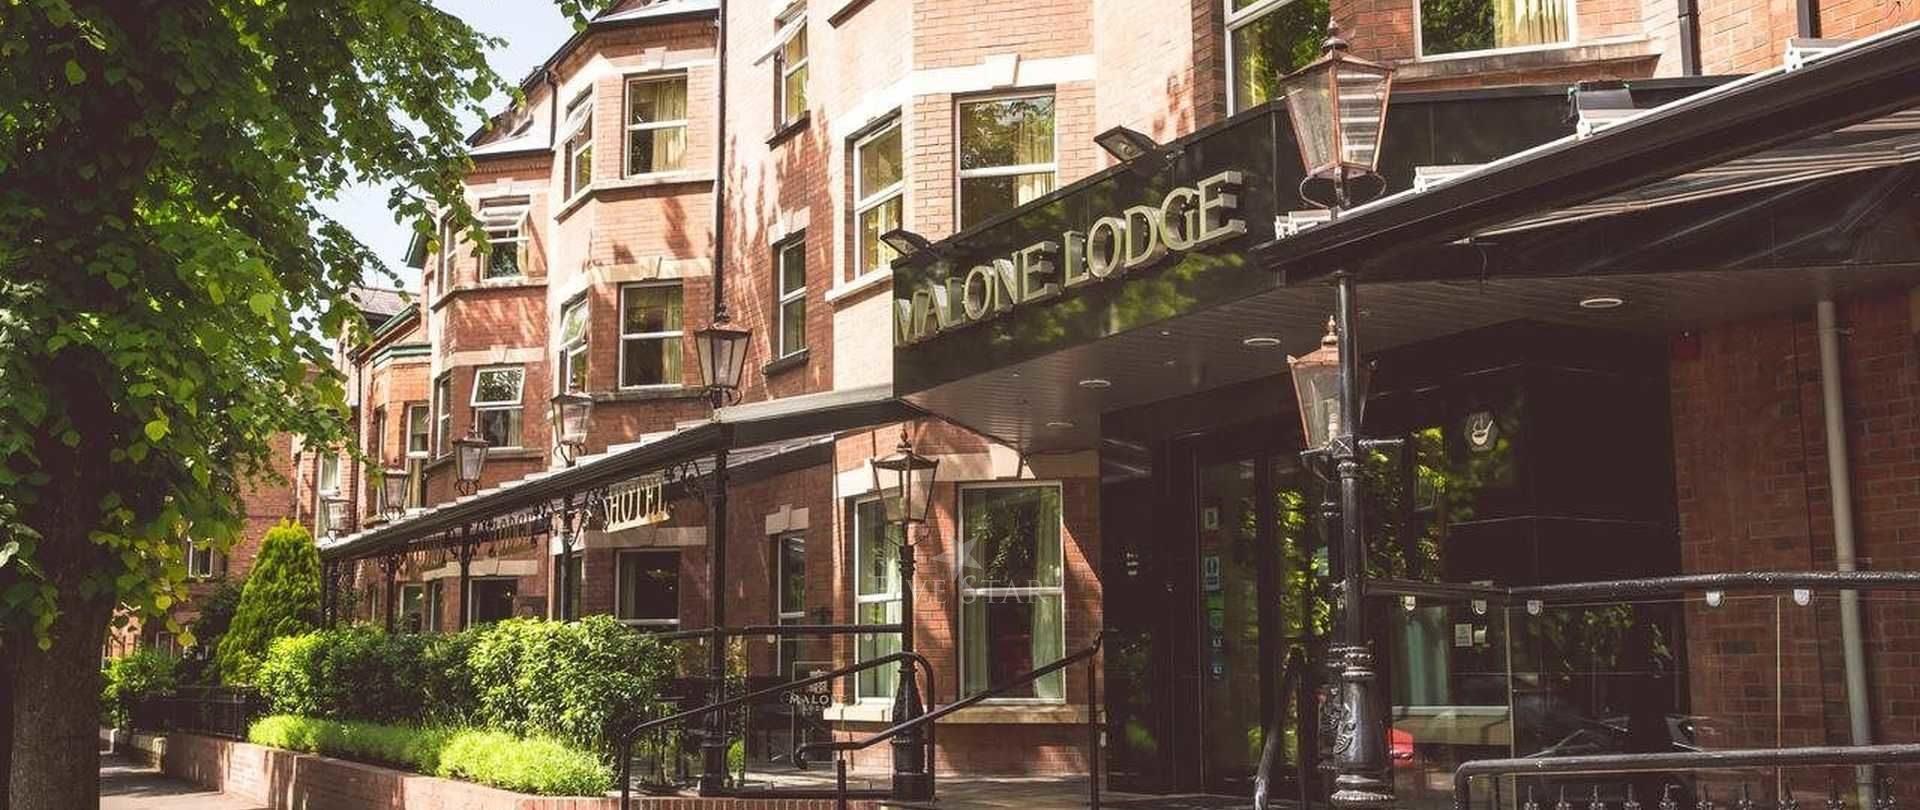 Malone Grove Apartments Group In Belfast Antrim Northern Ireland